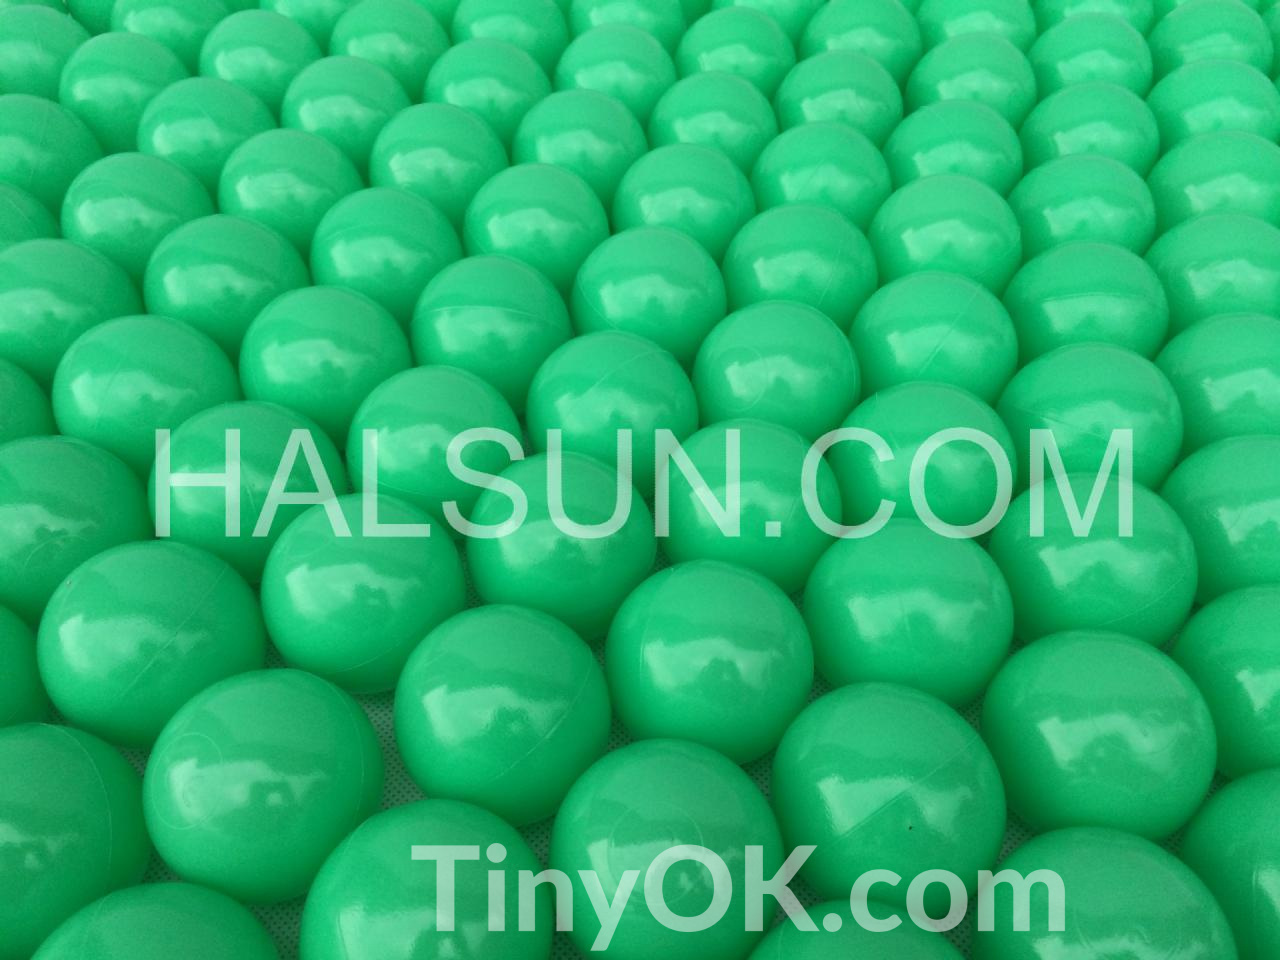 plastic-ocean-balls-17.jpg